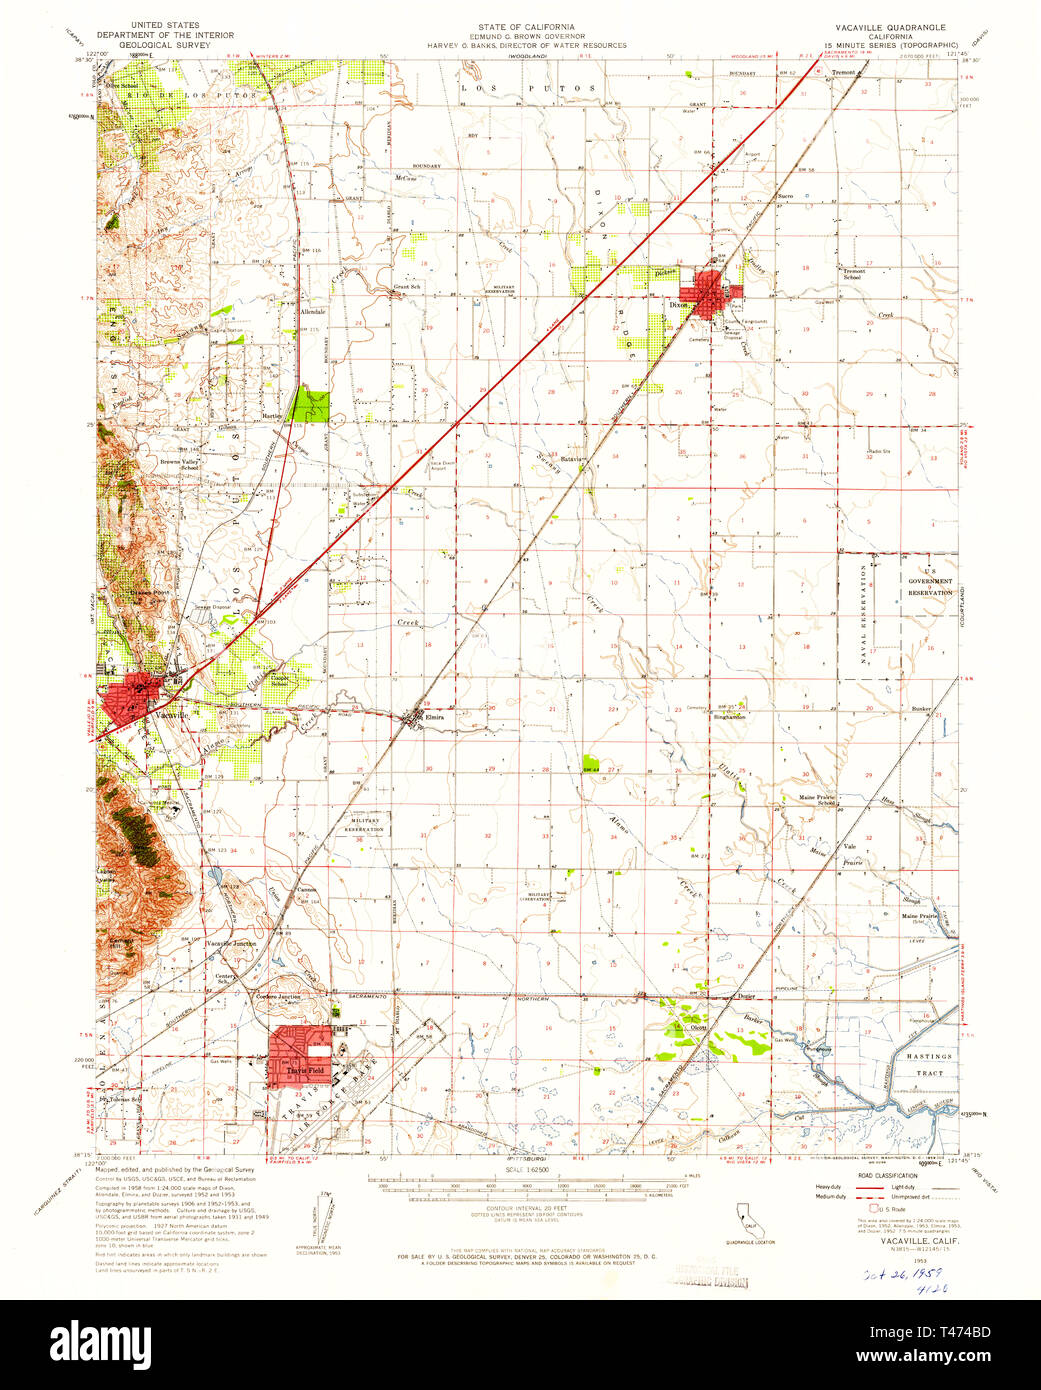 Map Of California Vacaville.Usgs Topo Map California Ca Vacaville 301915 1953 62500 Restoration